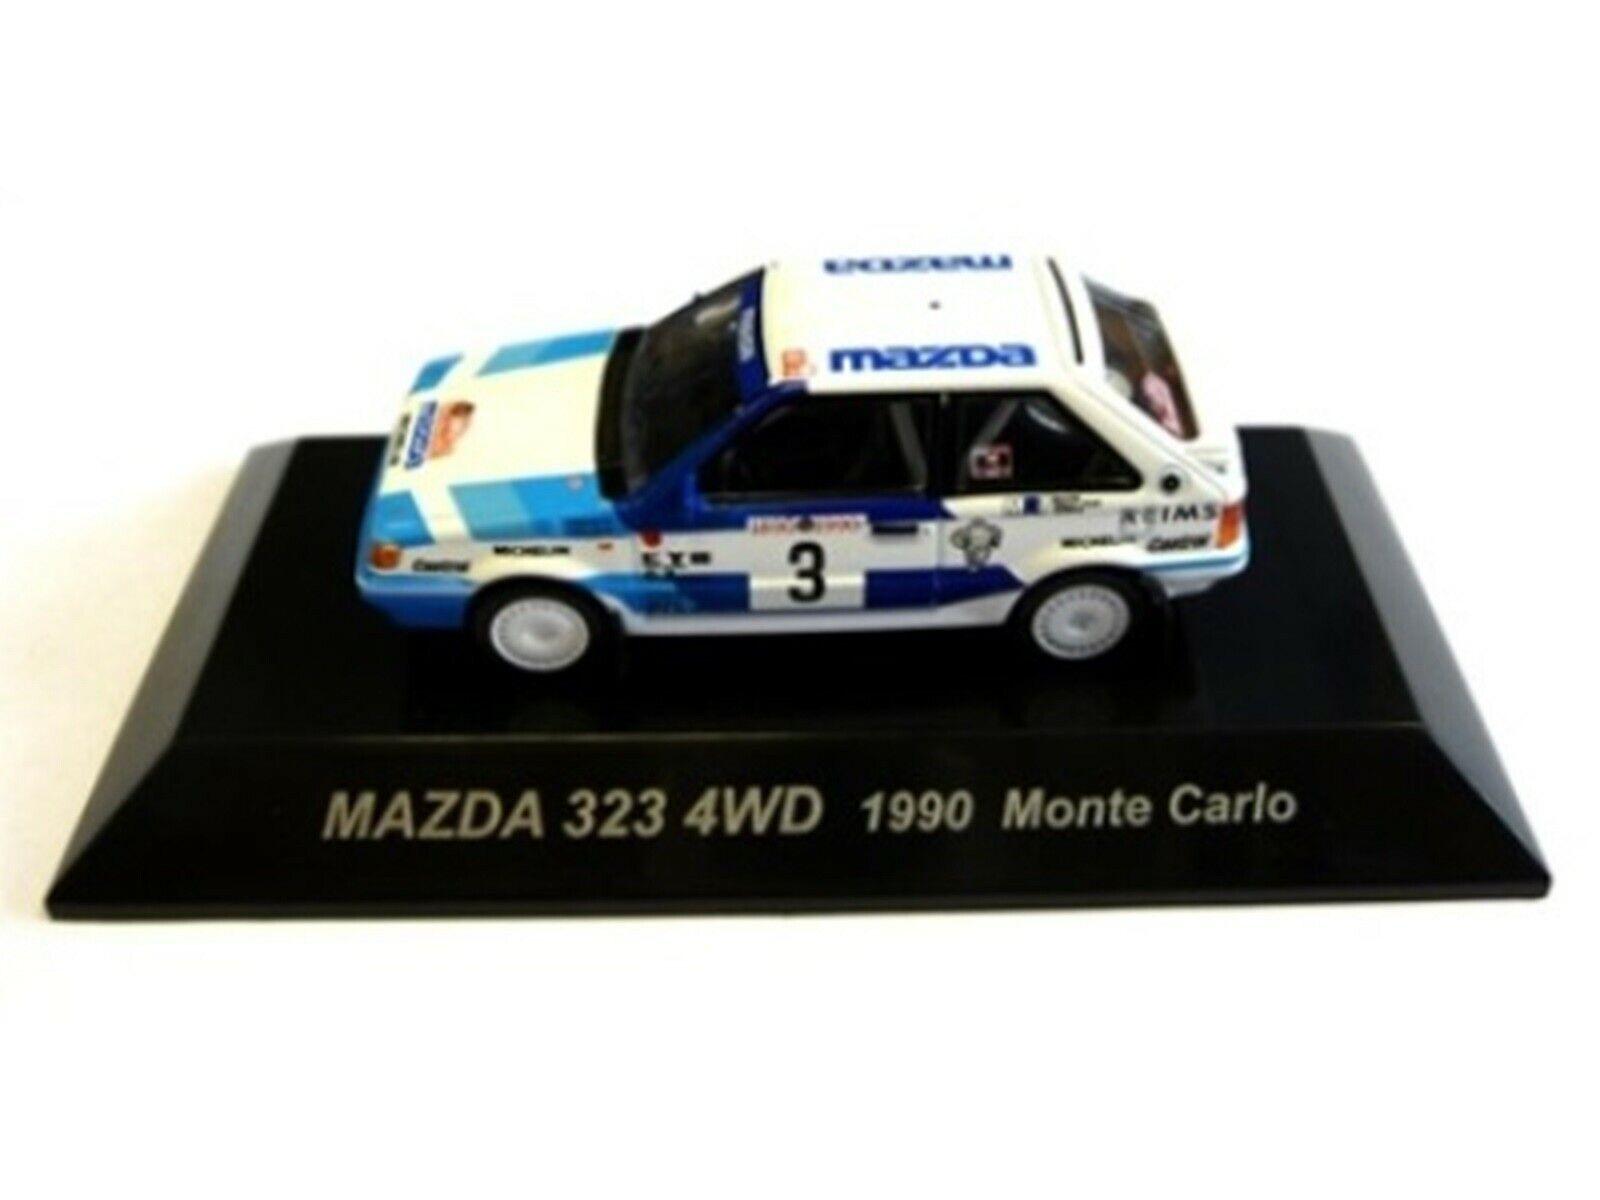 Wow extremadonnate raro Mazda 323 4WD Turbo 1990 M. Carlo WRC 1 64 Cm 's Kyosho-RX7